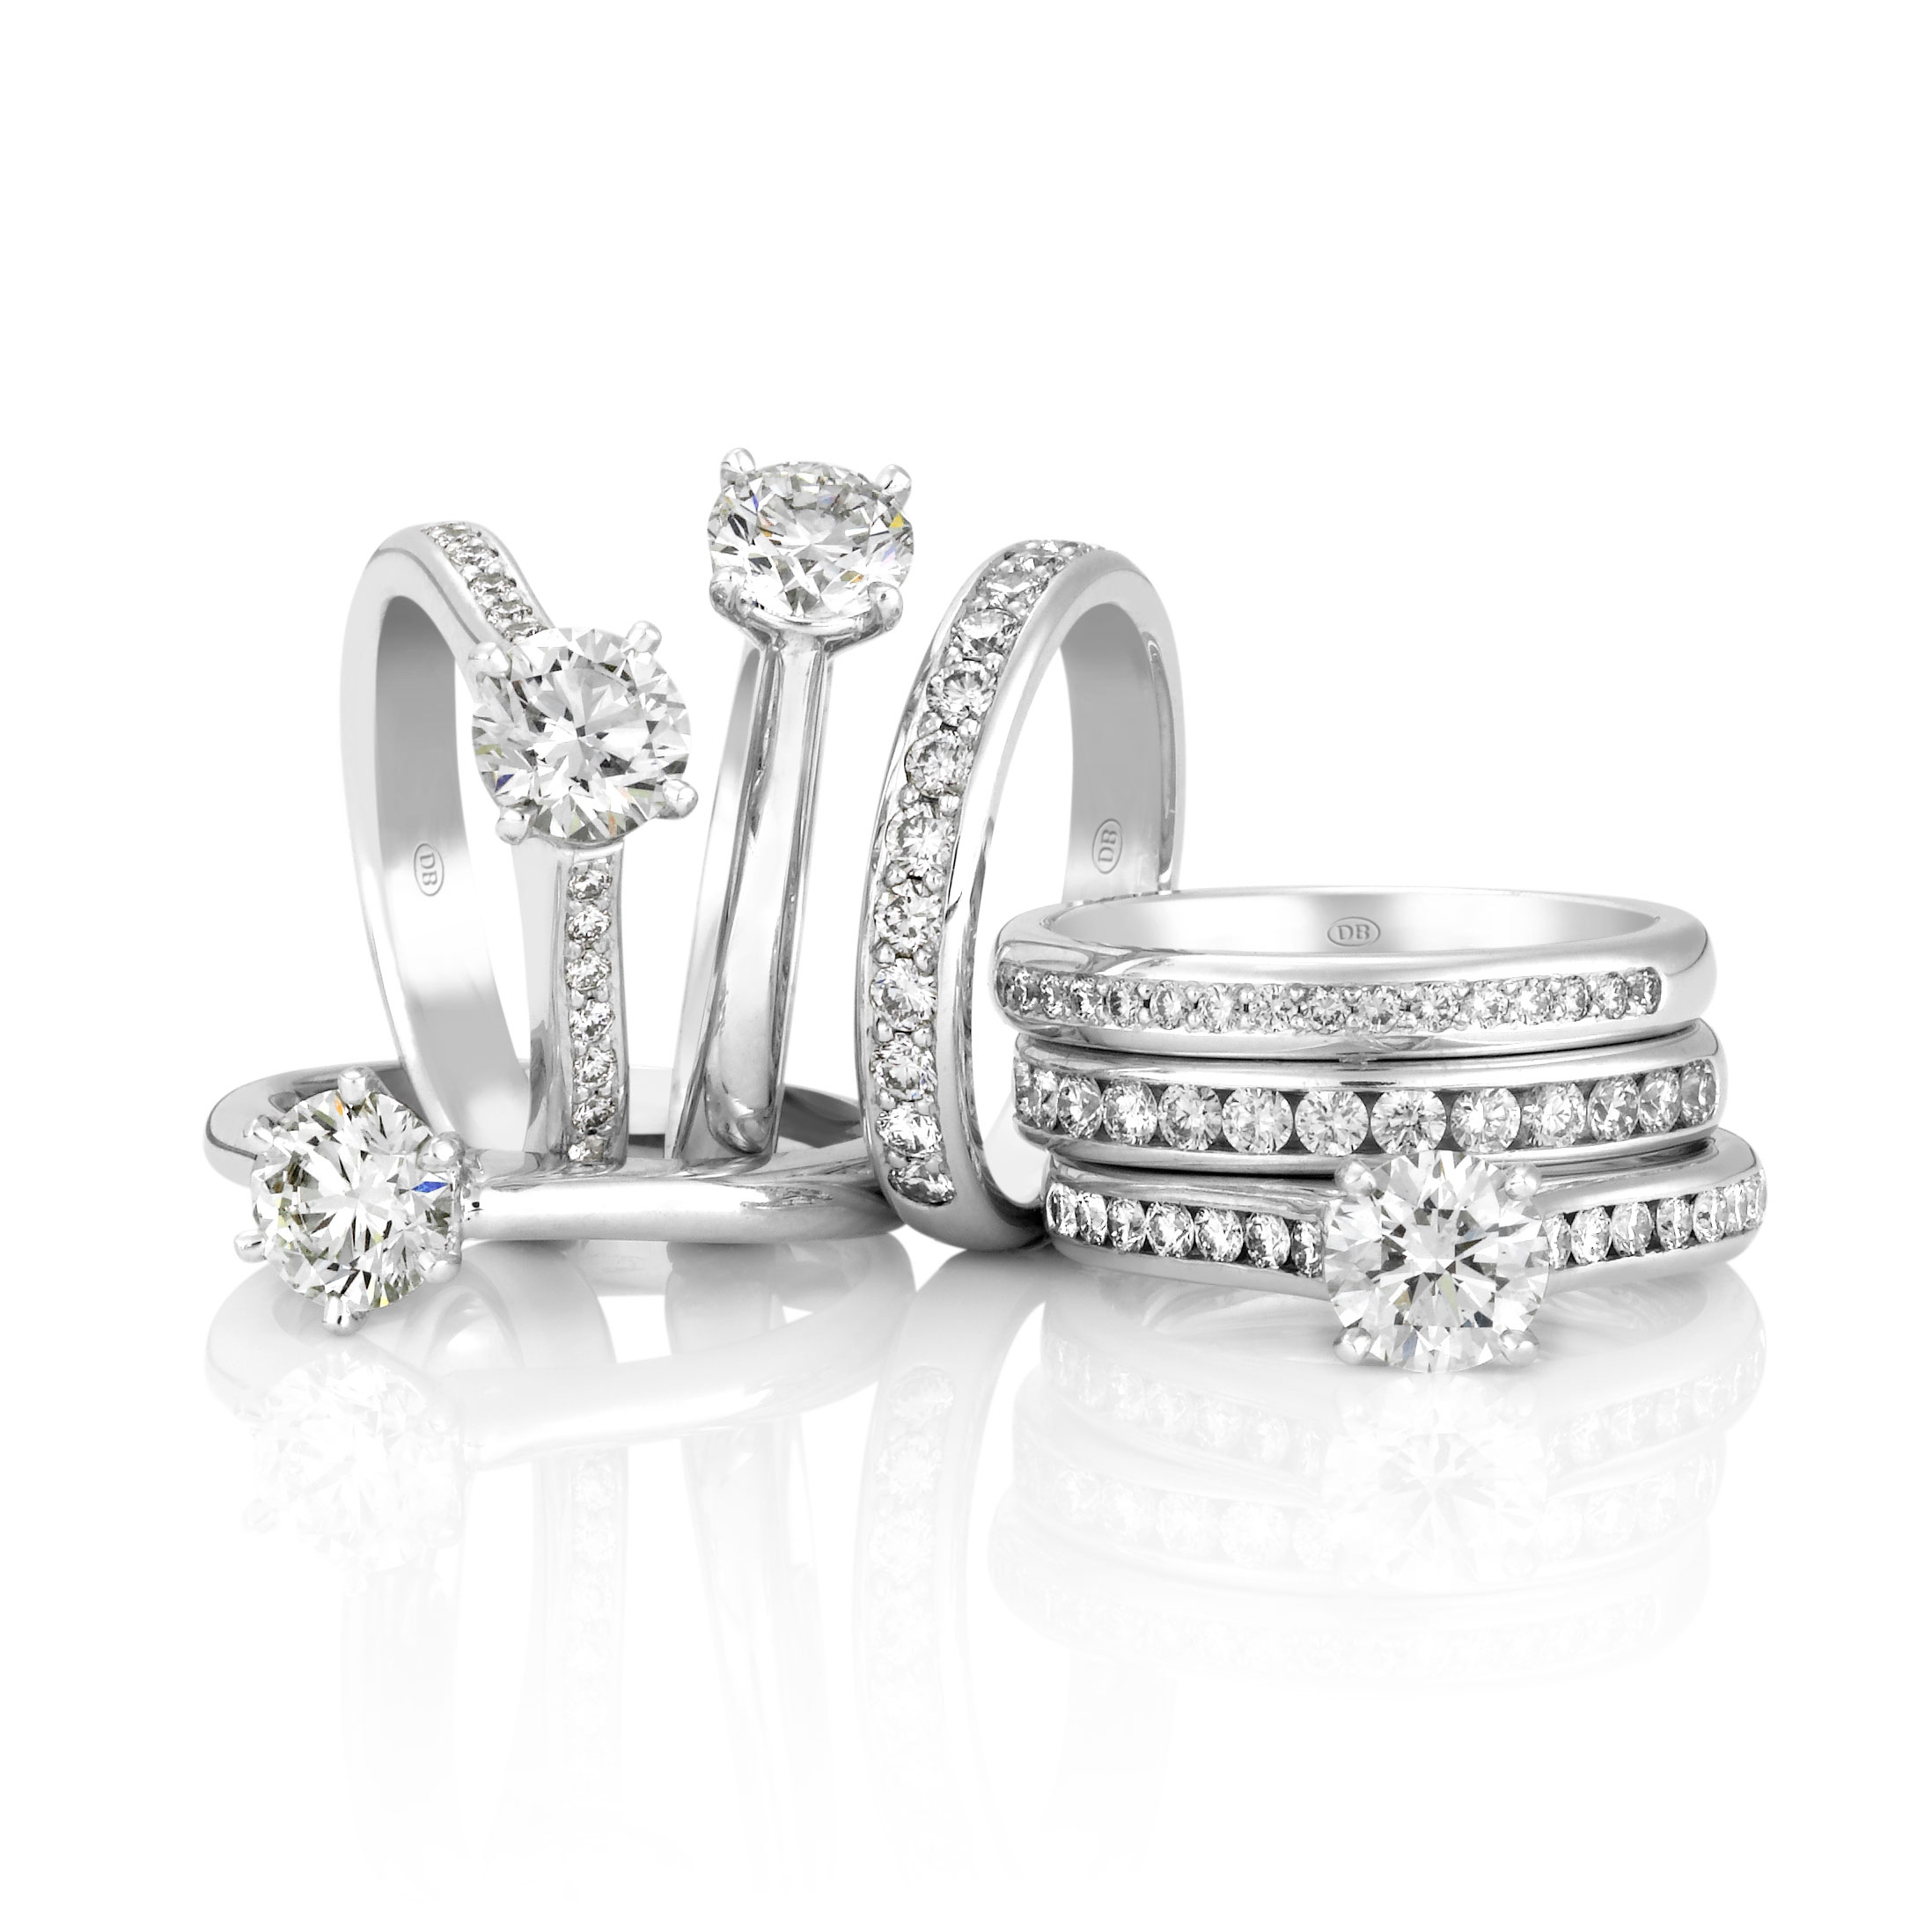 Engagement rings. Diamond rings. Wedding bands. Eternity rings. David Benn Fine Jewellery, Sydney, Australia.